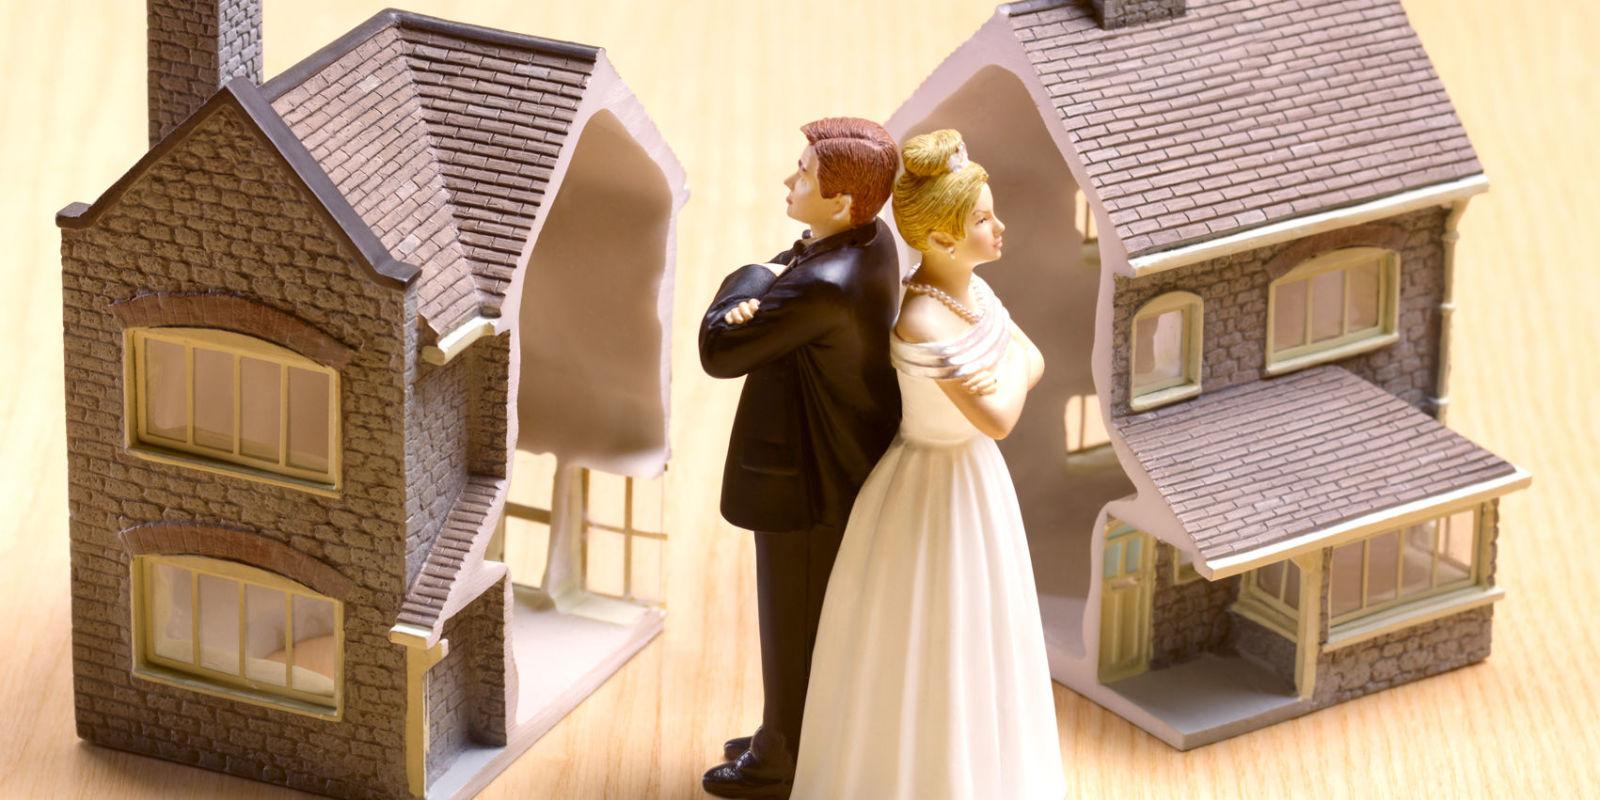 раздел имущество в разводе